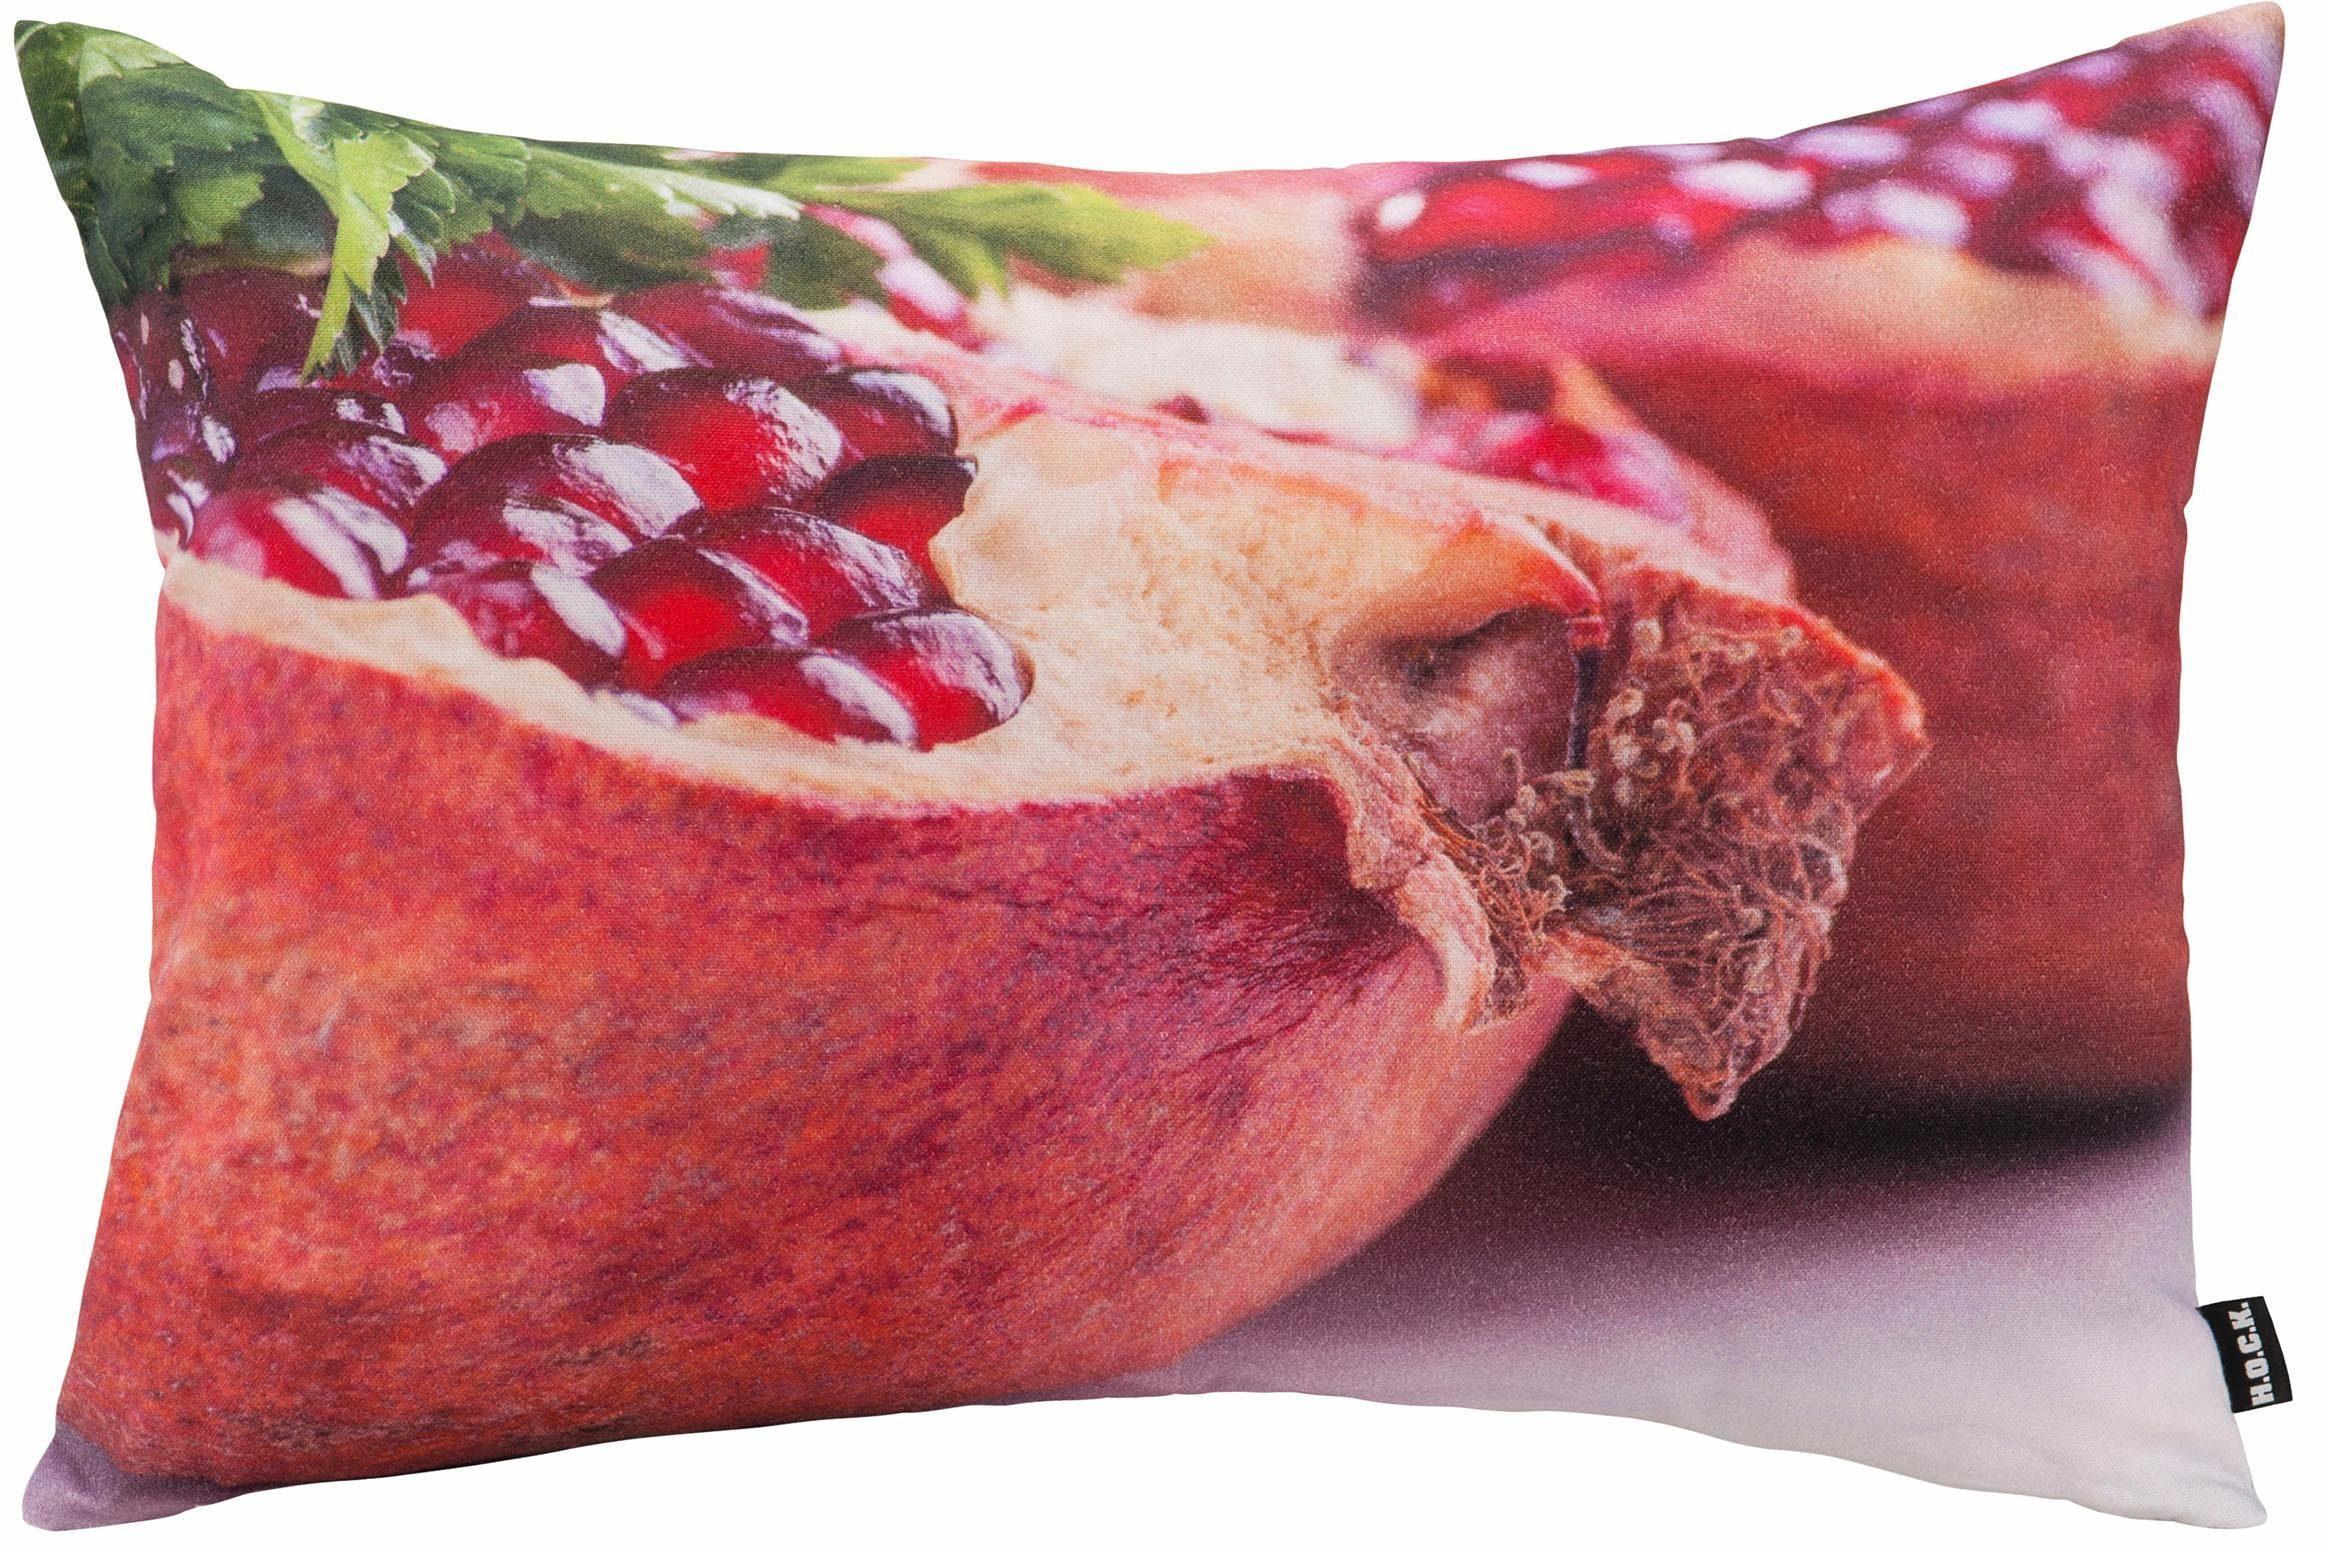 Hock Kissen mit Granatapfelmotiv